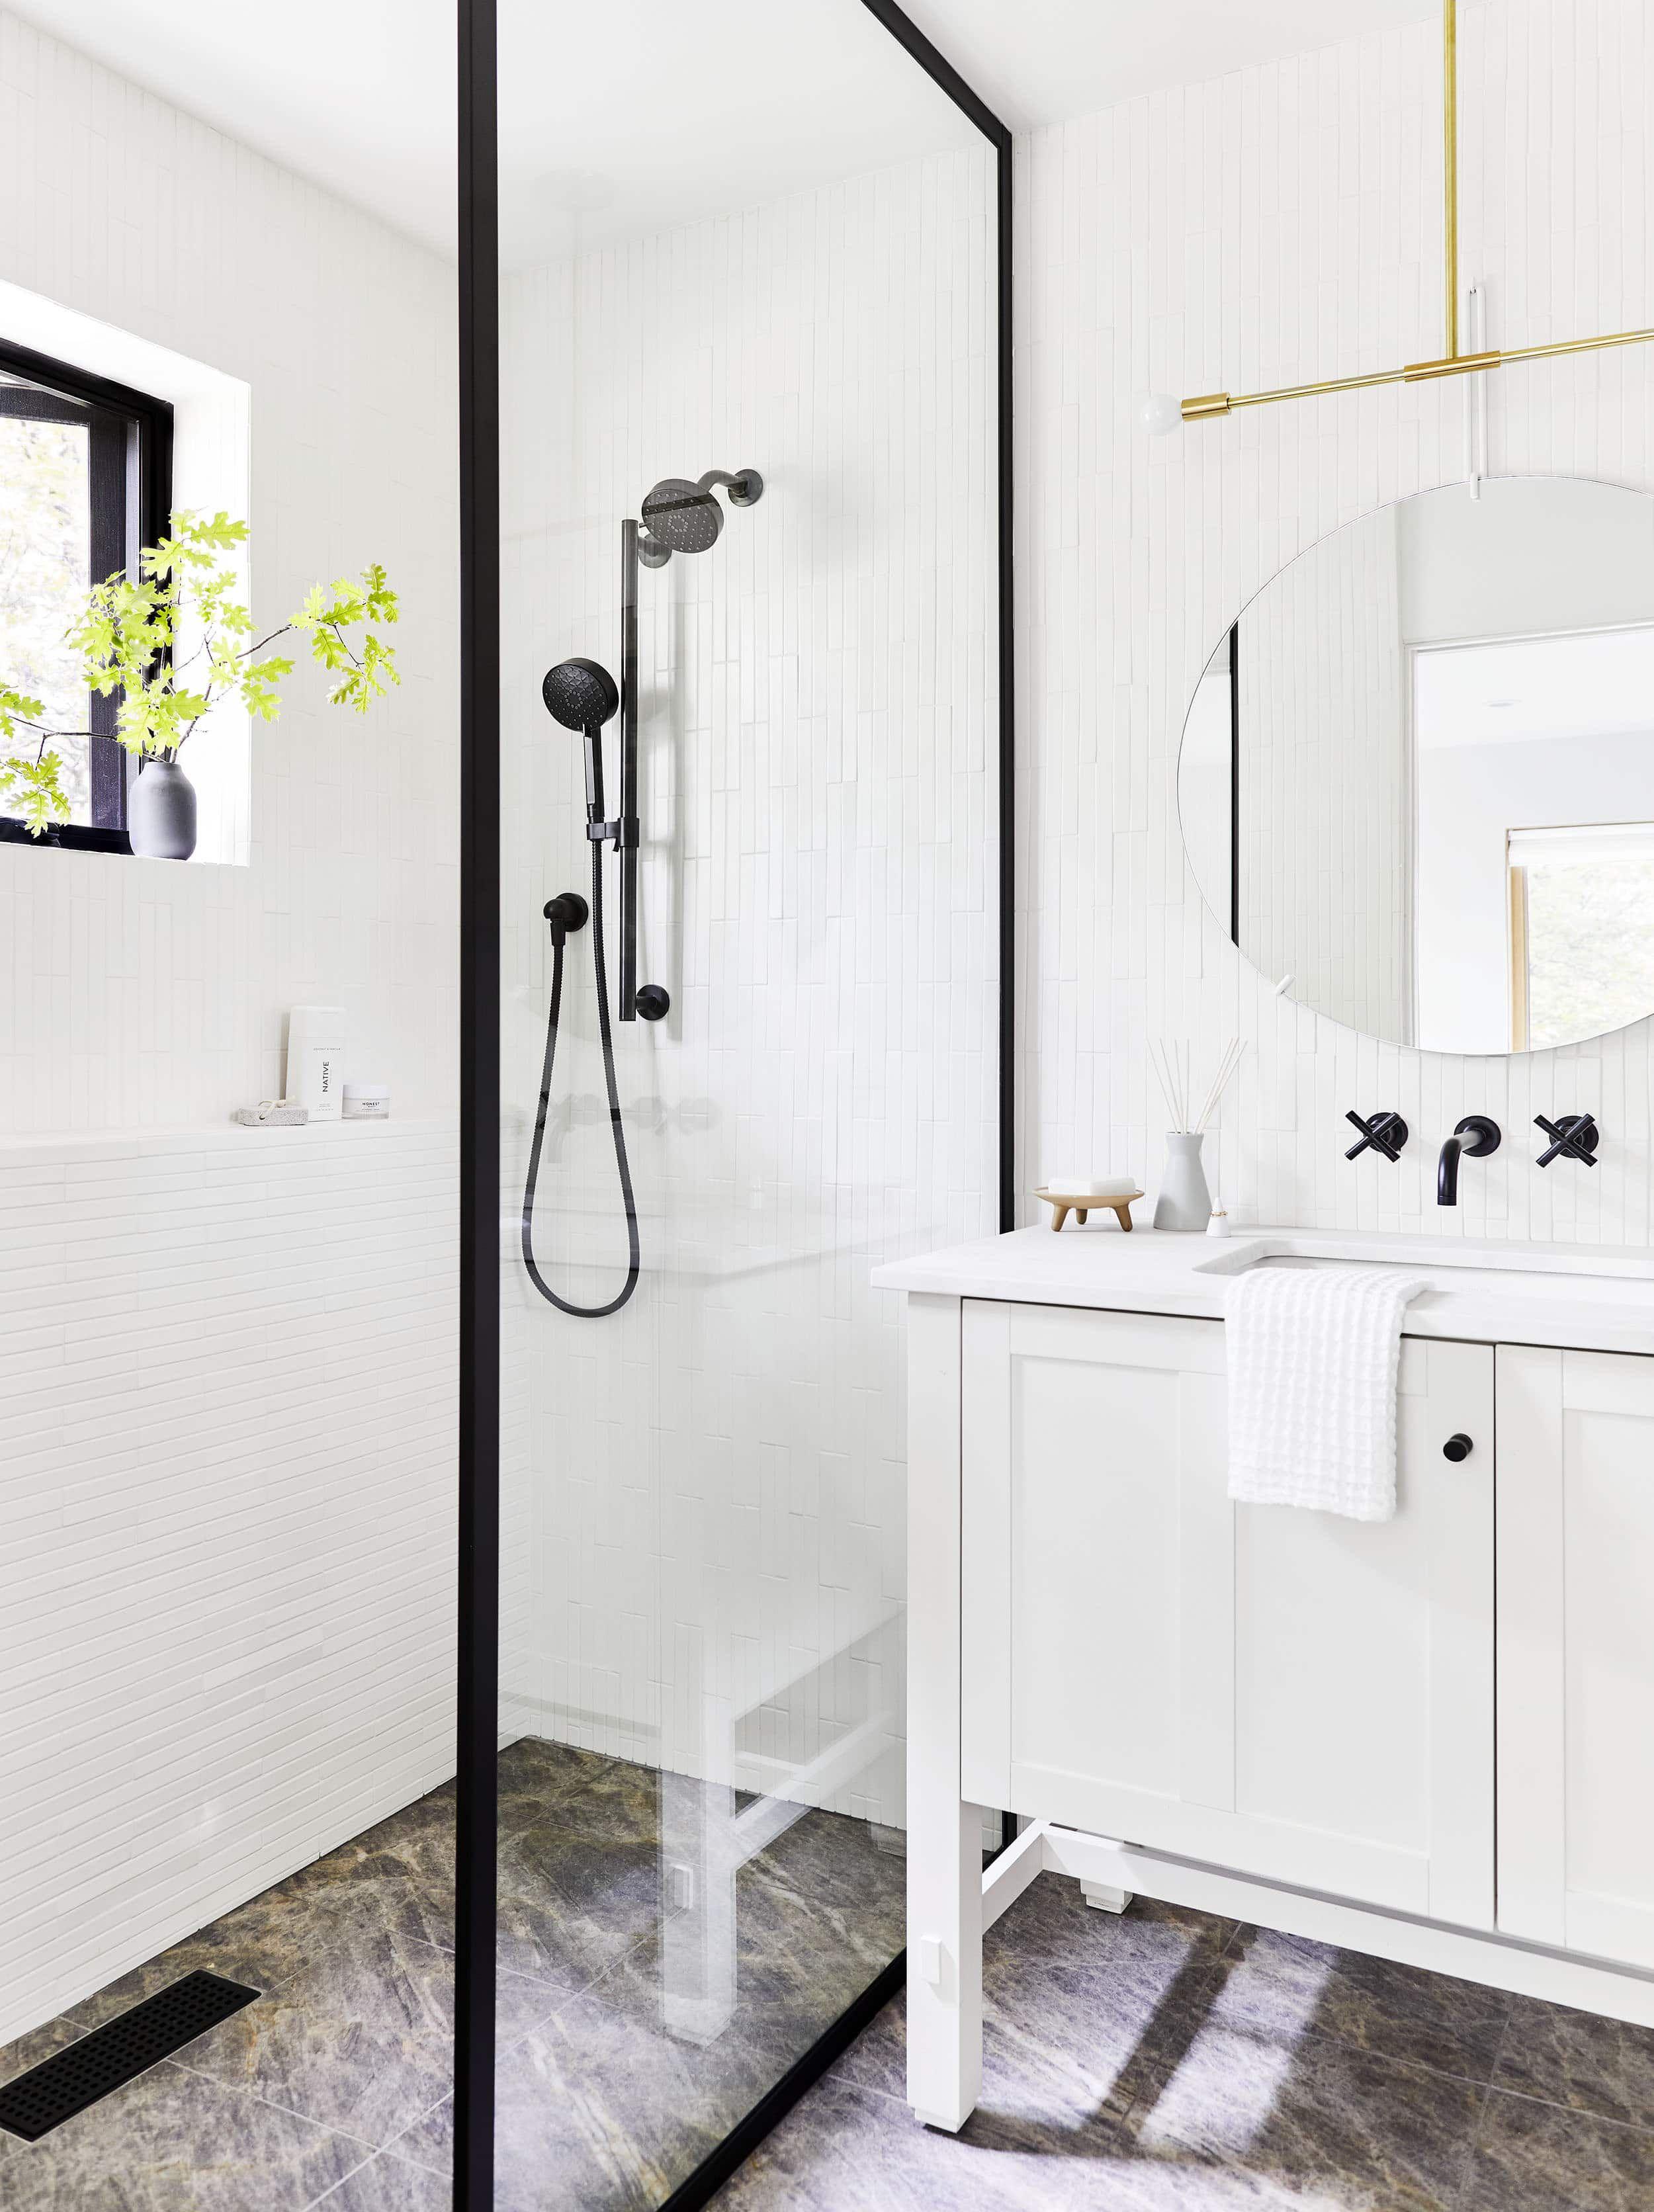 Mountain House Reveal The Closet Turned Modern Guest Bathroom Guest Bathroom Bathroom Inspiration Modern Shower